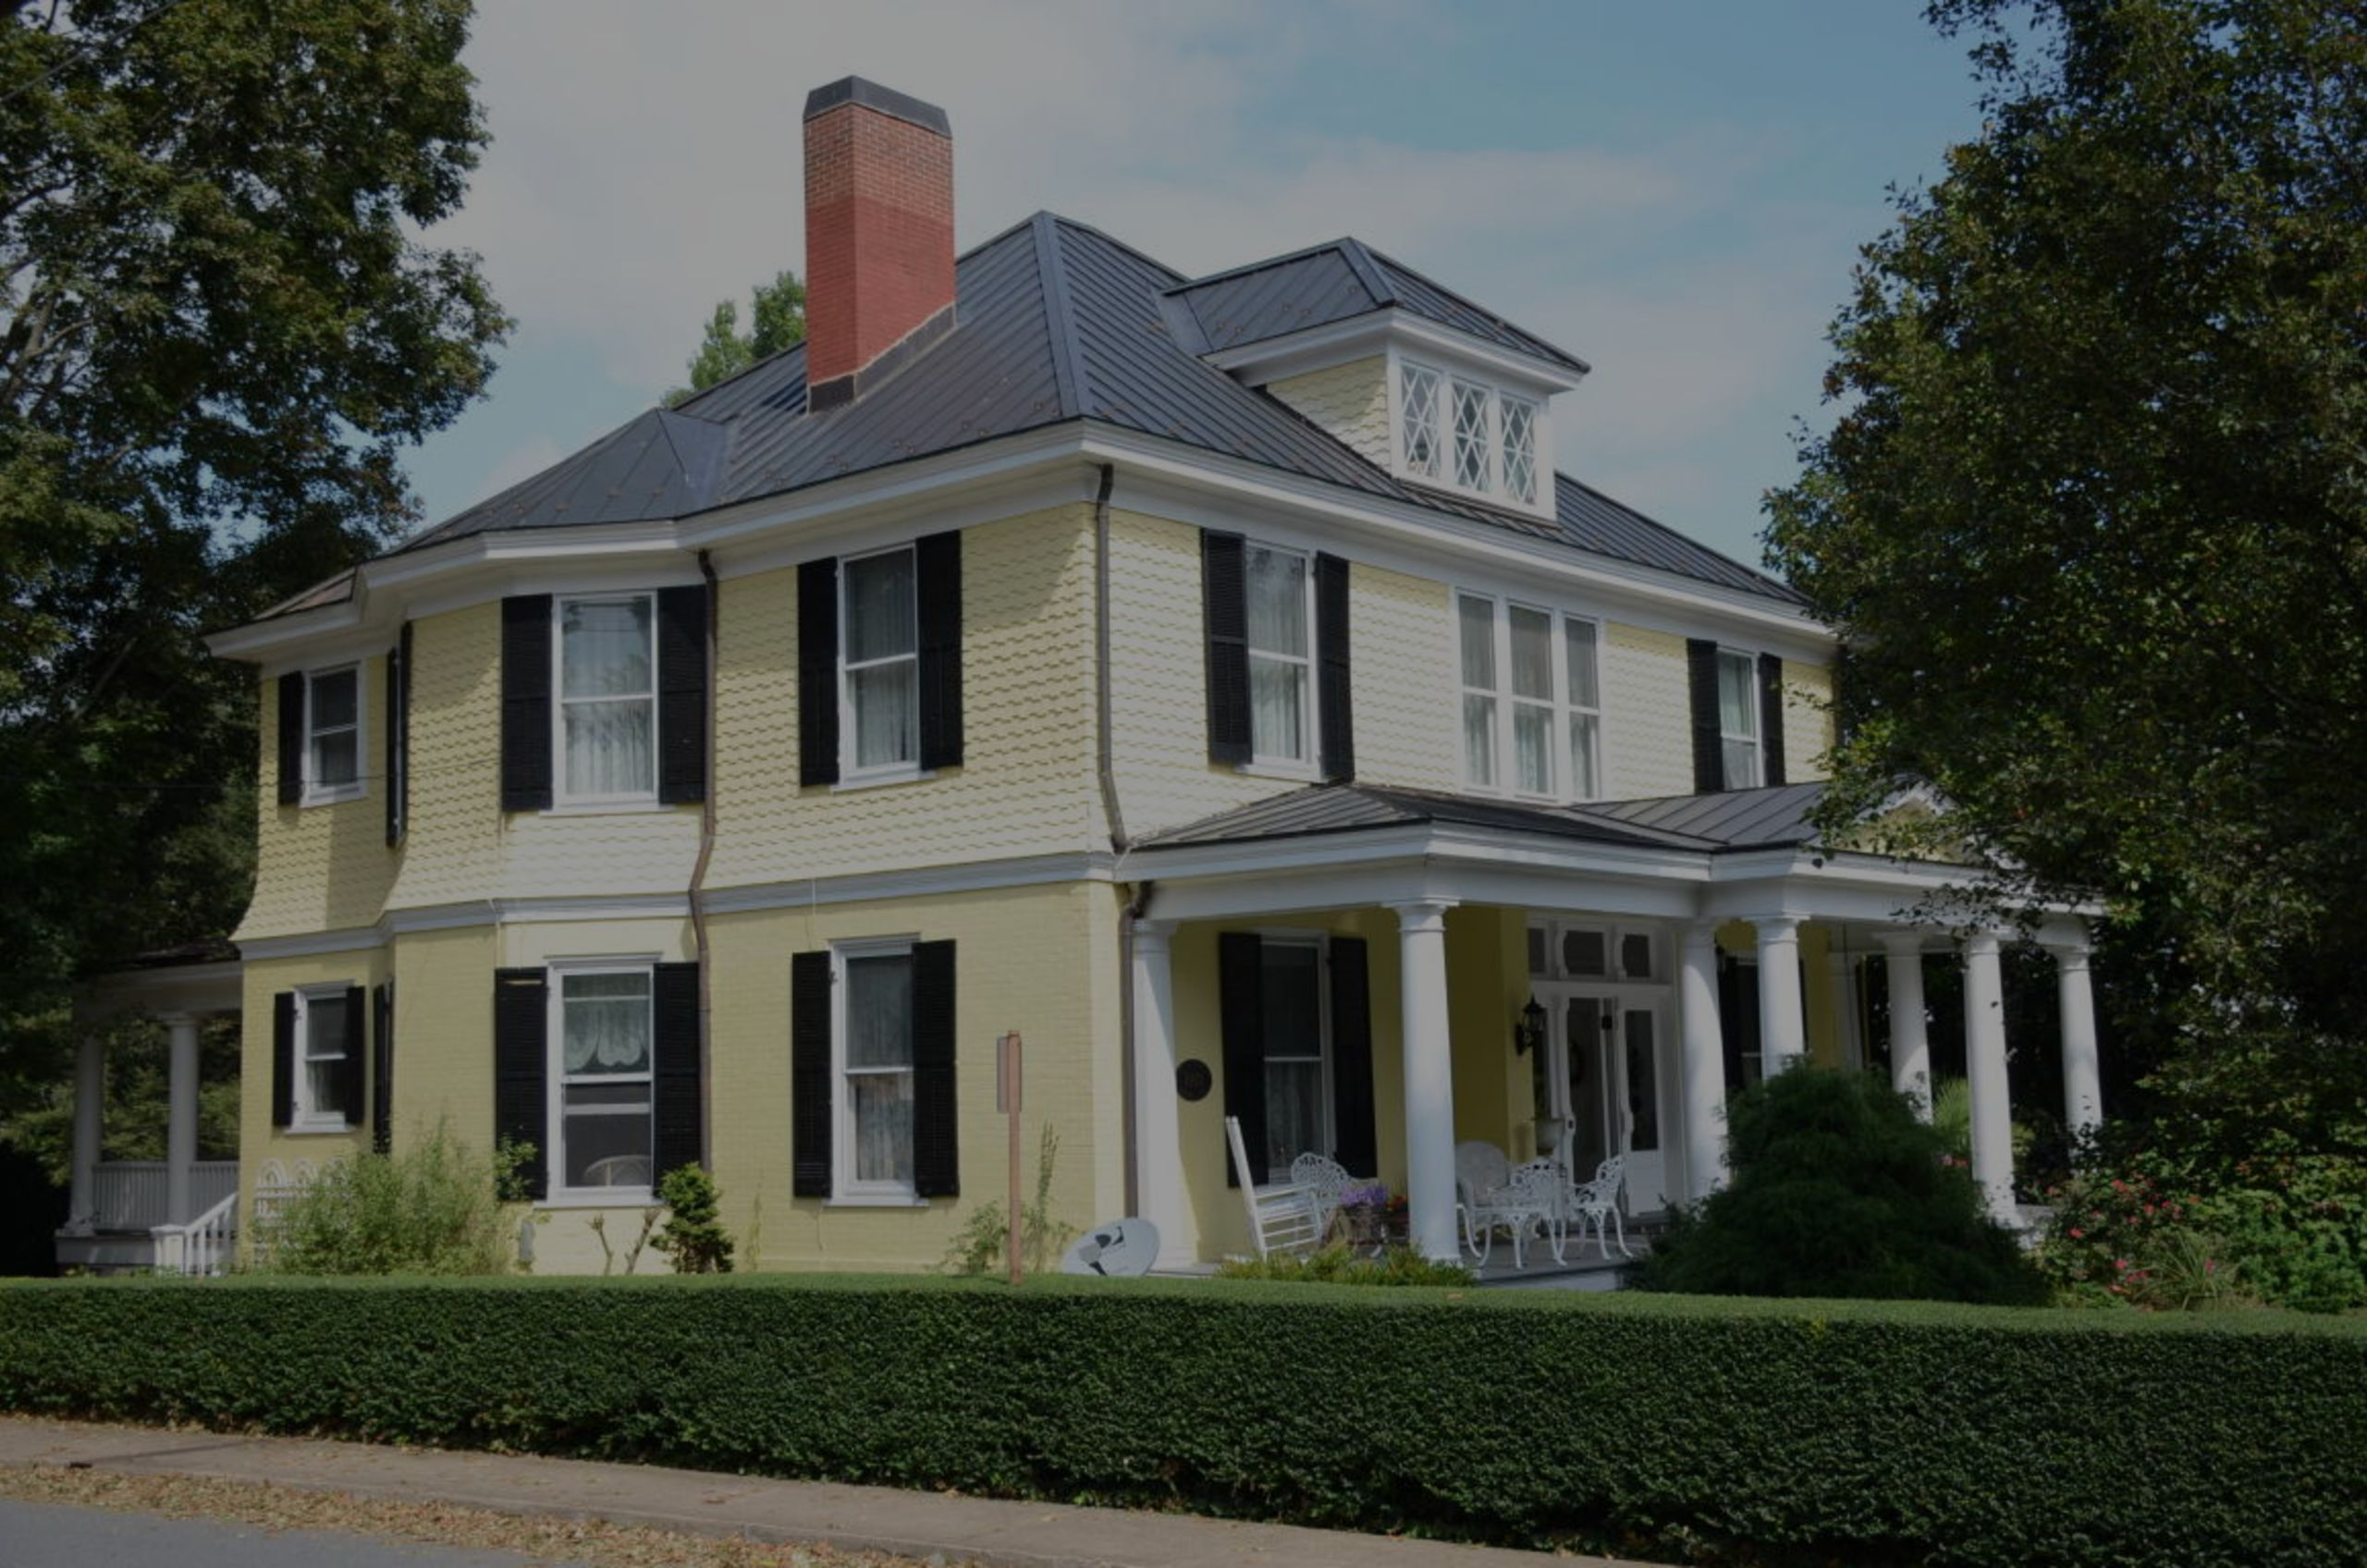 Top Eight Historic Homes in Rockbridge and surrounding counties